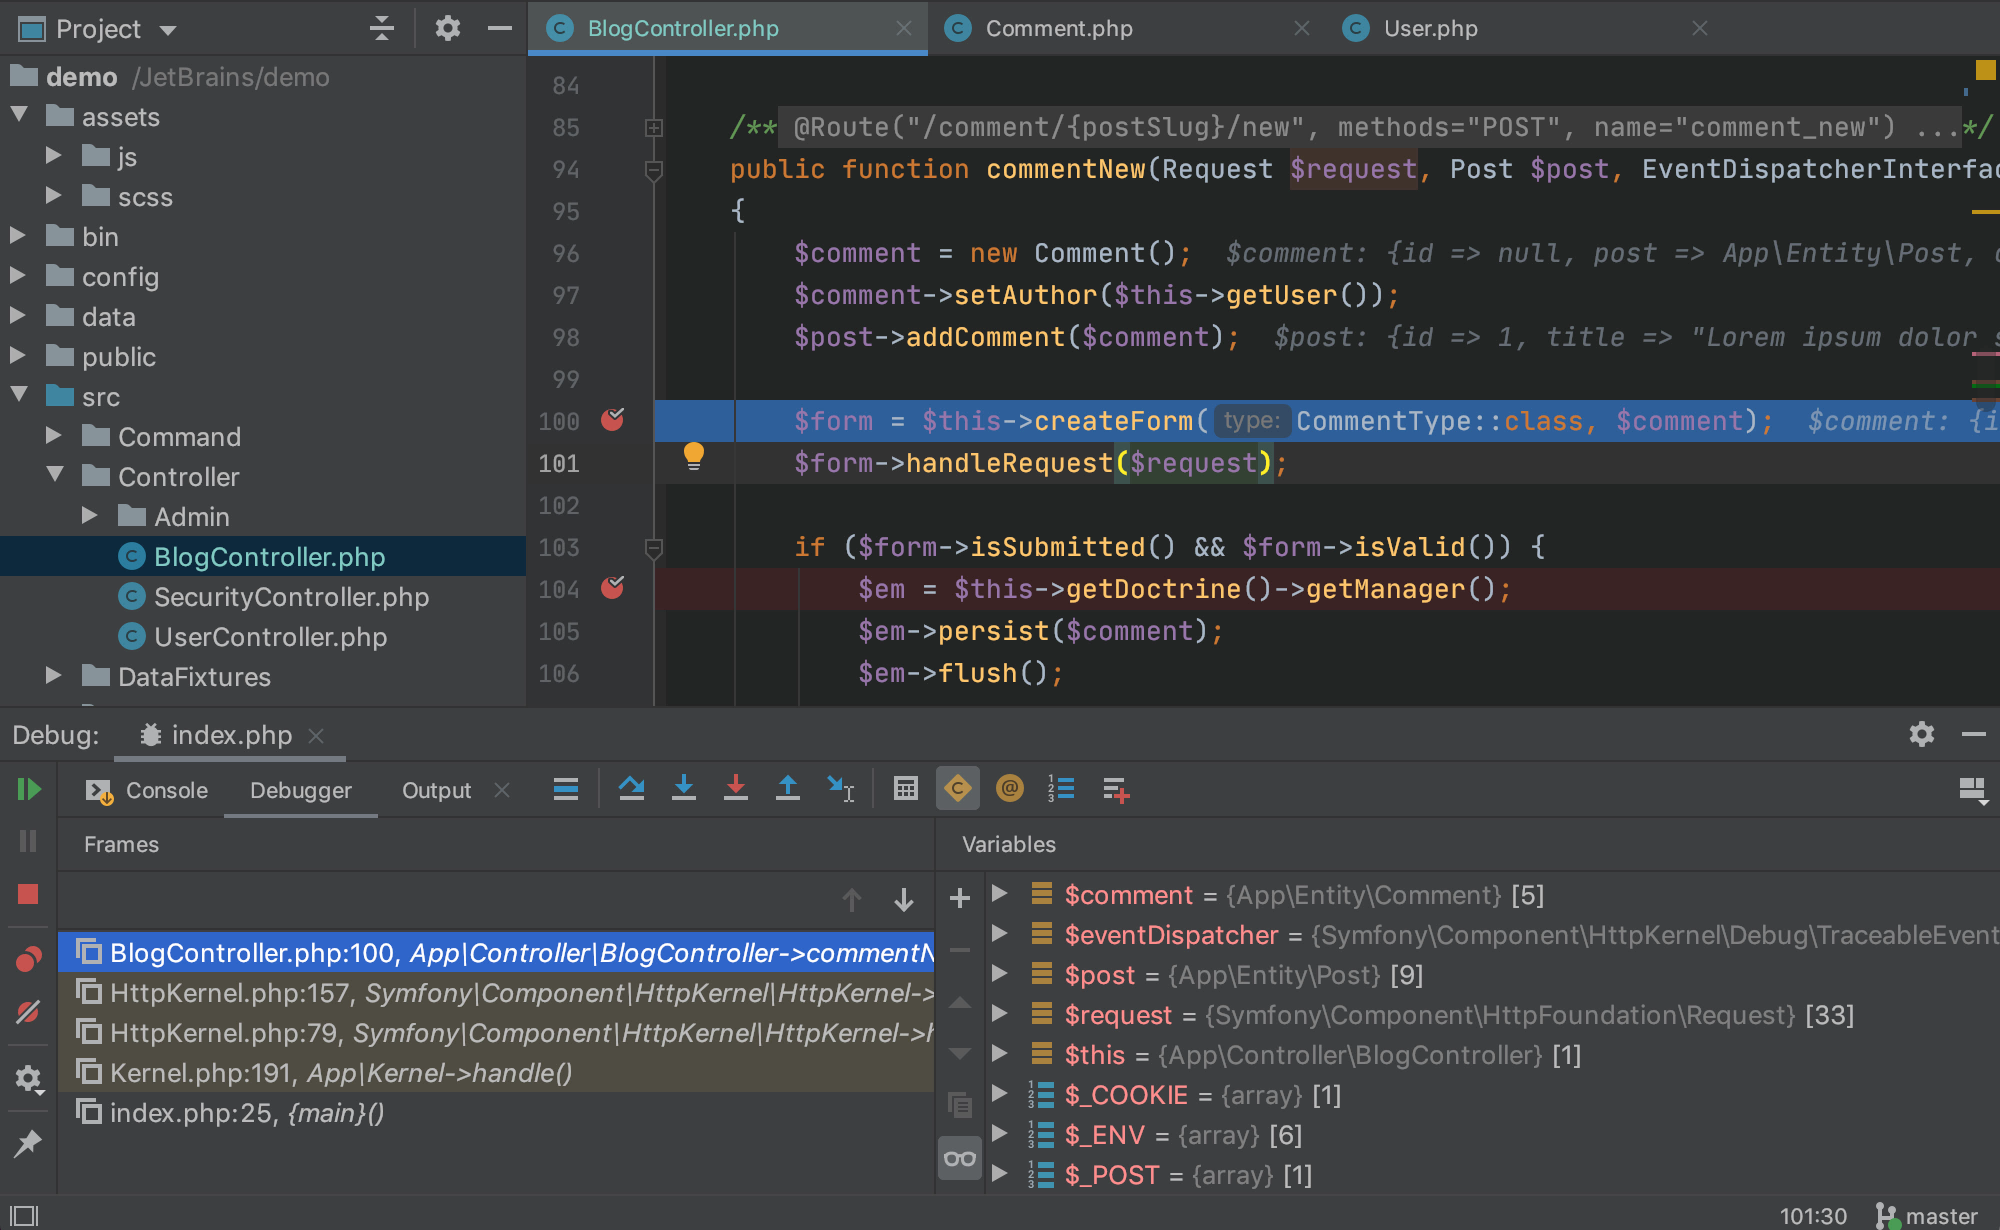 PhpStorm debug code